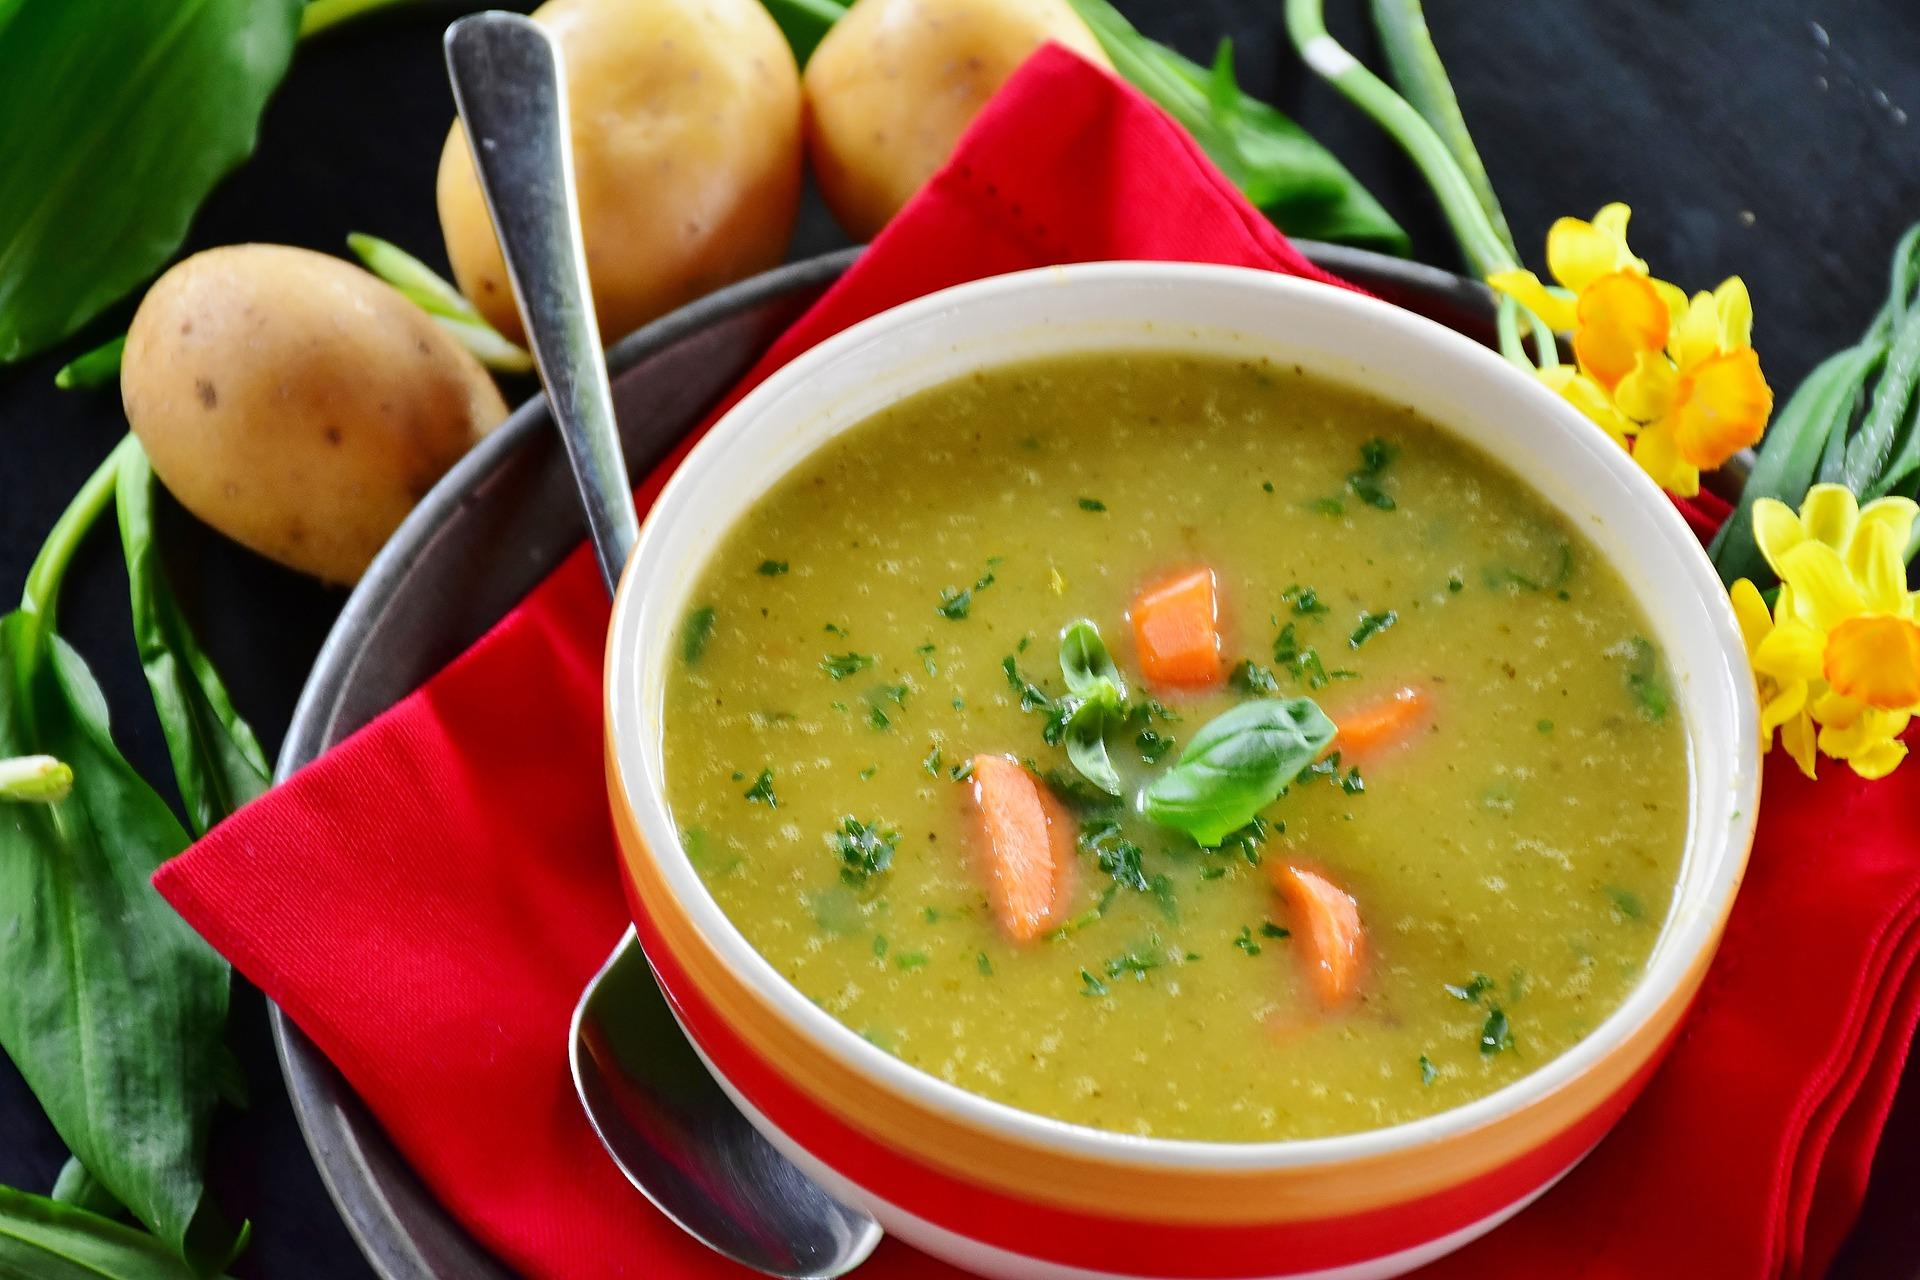 potato-soup-2152254 1920